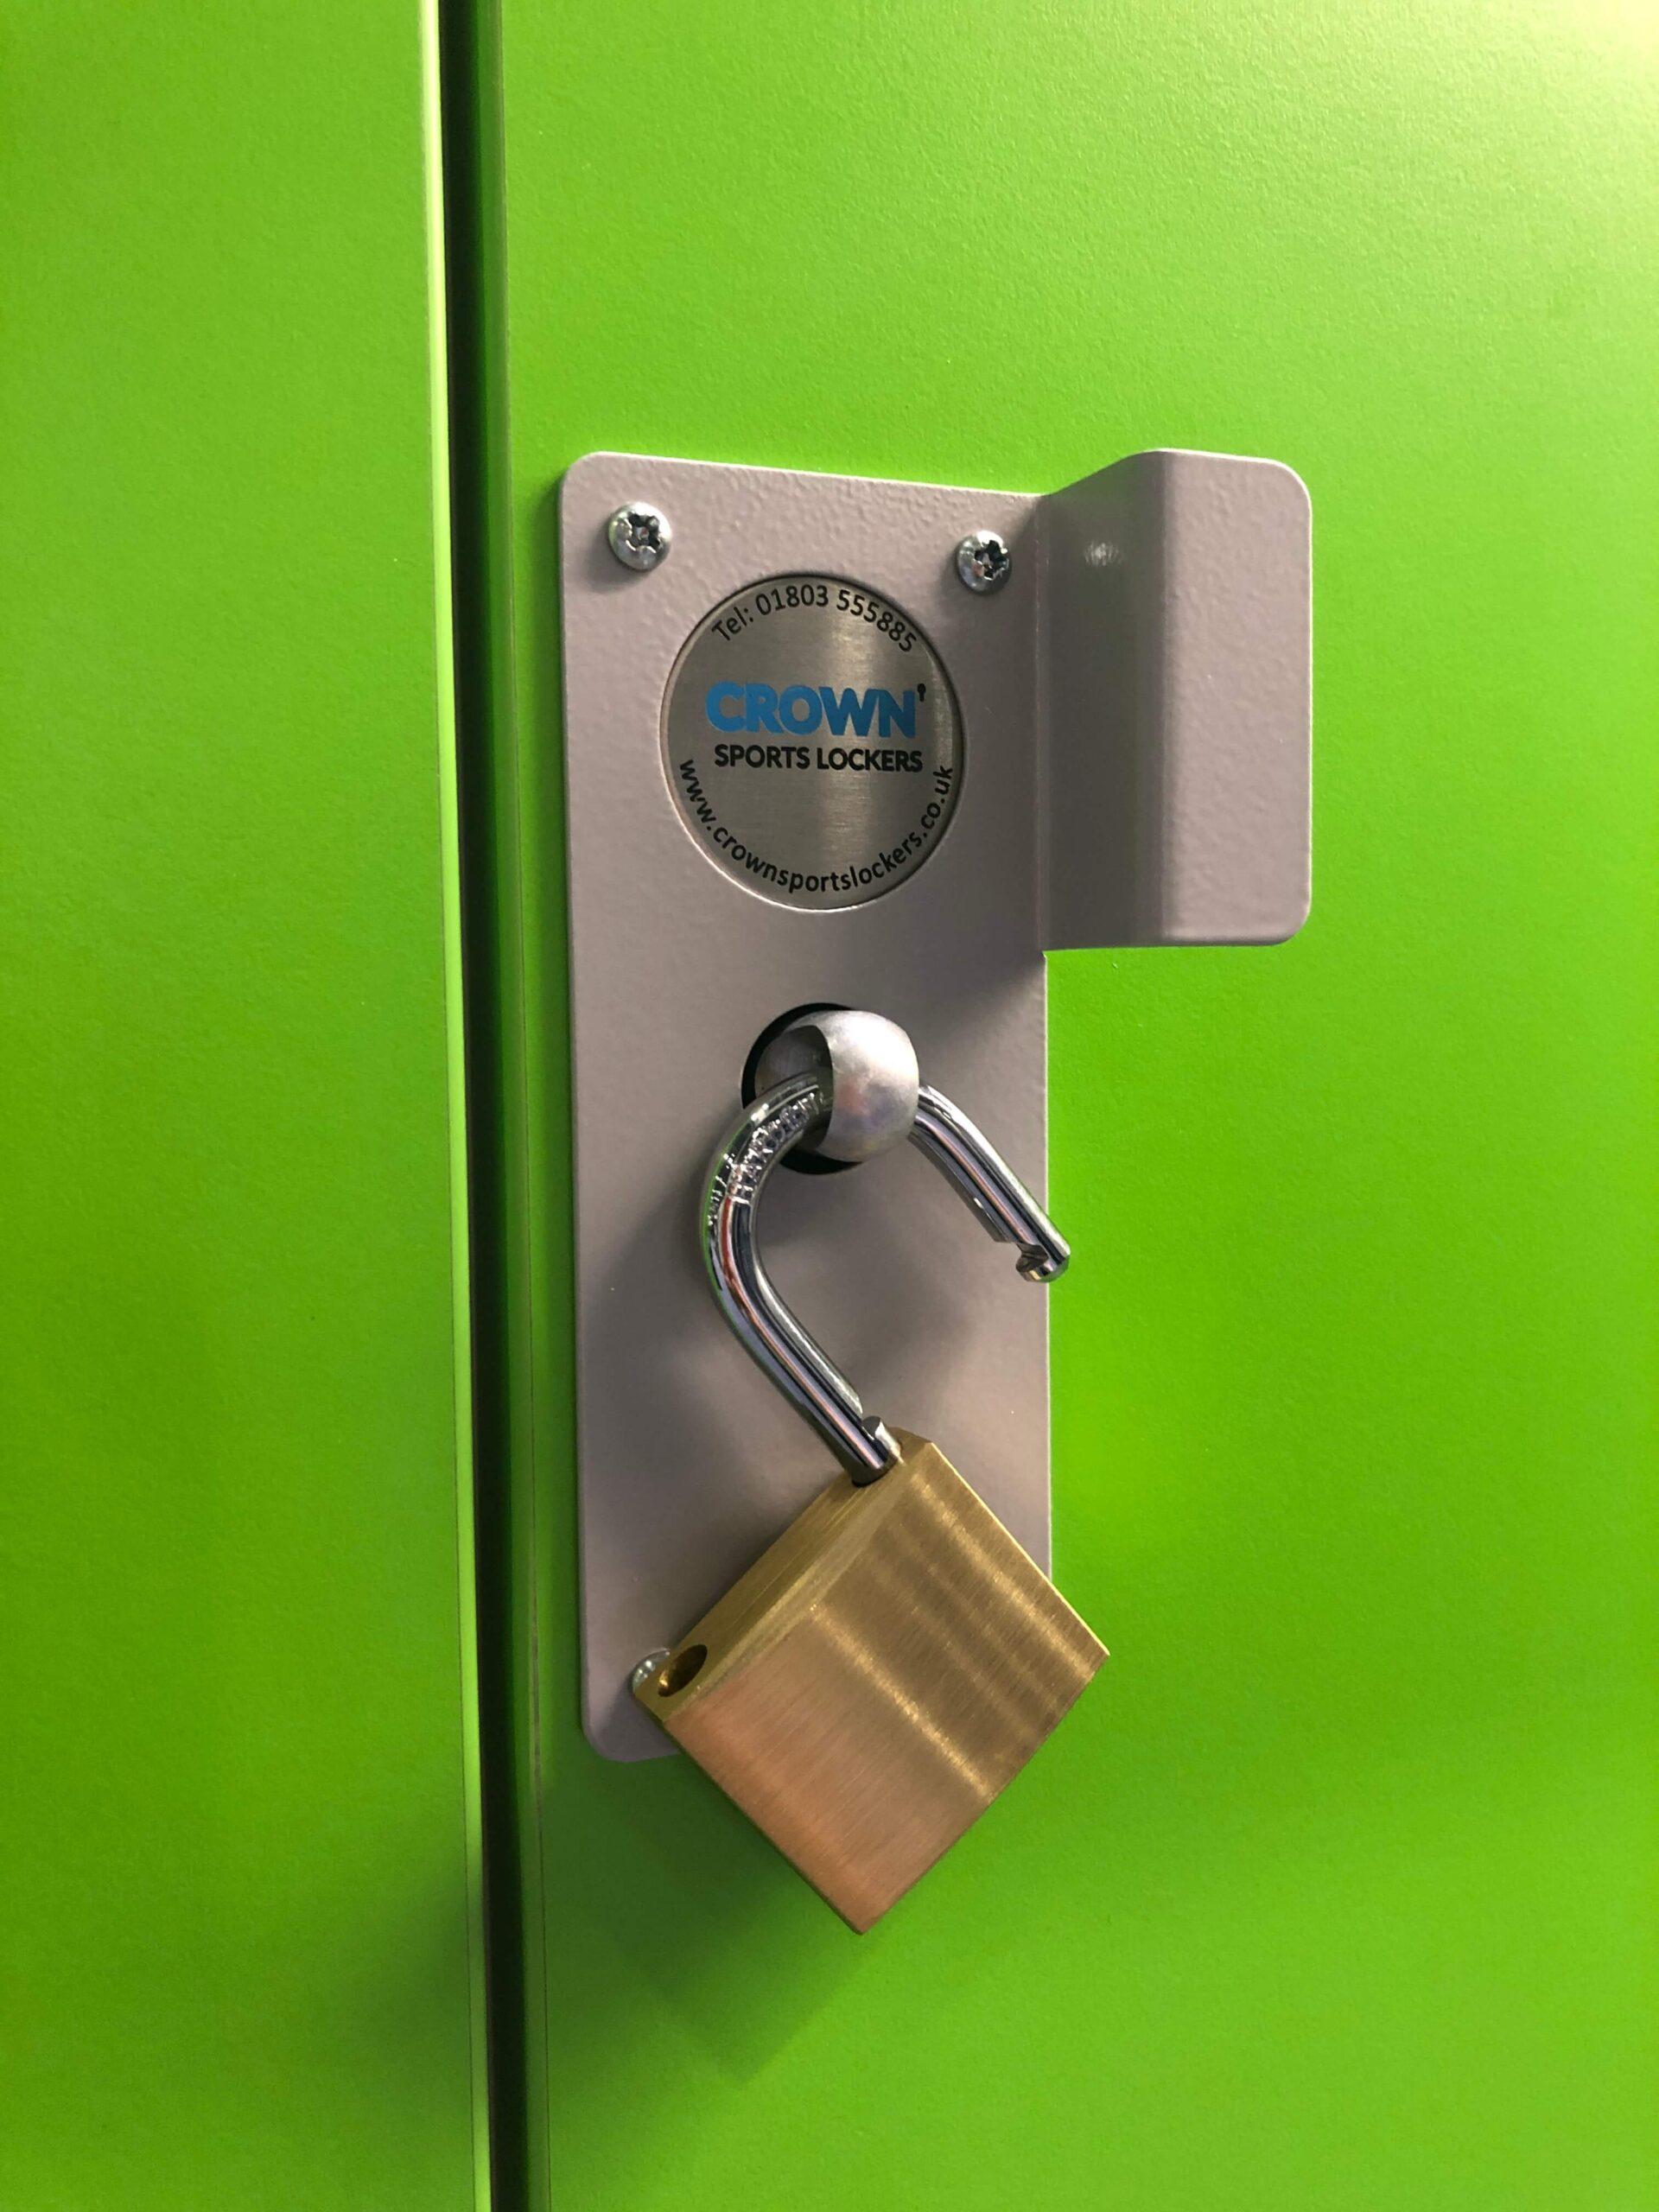 Locker Security_Padlock _Crown_Sports_Lockers